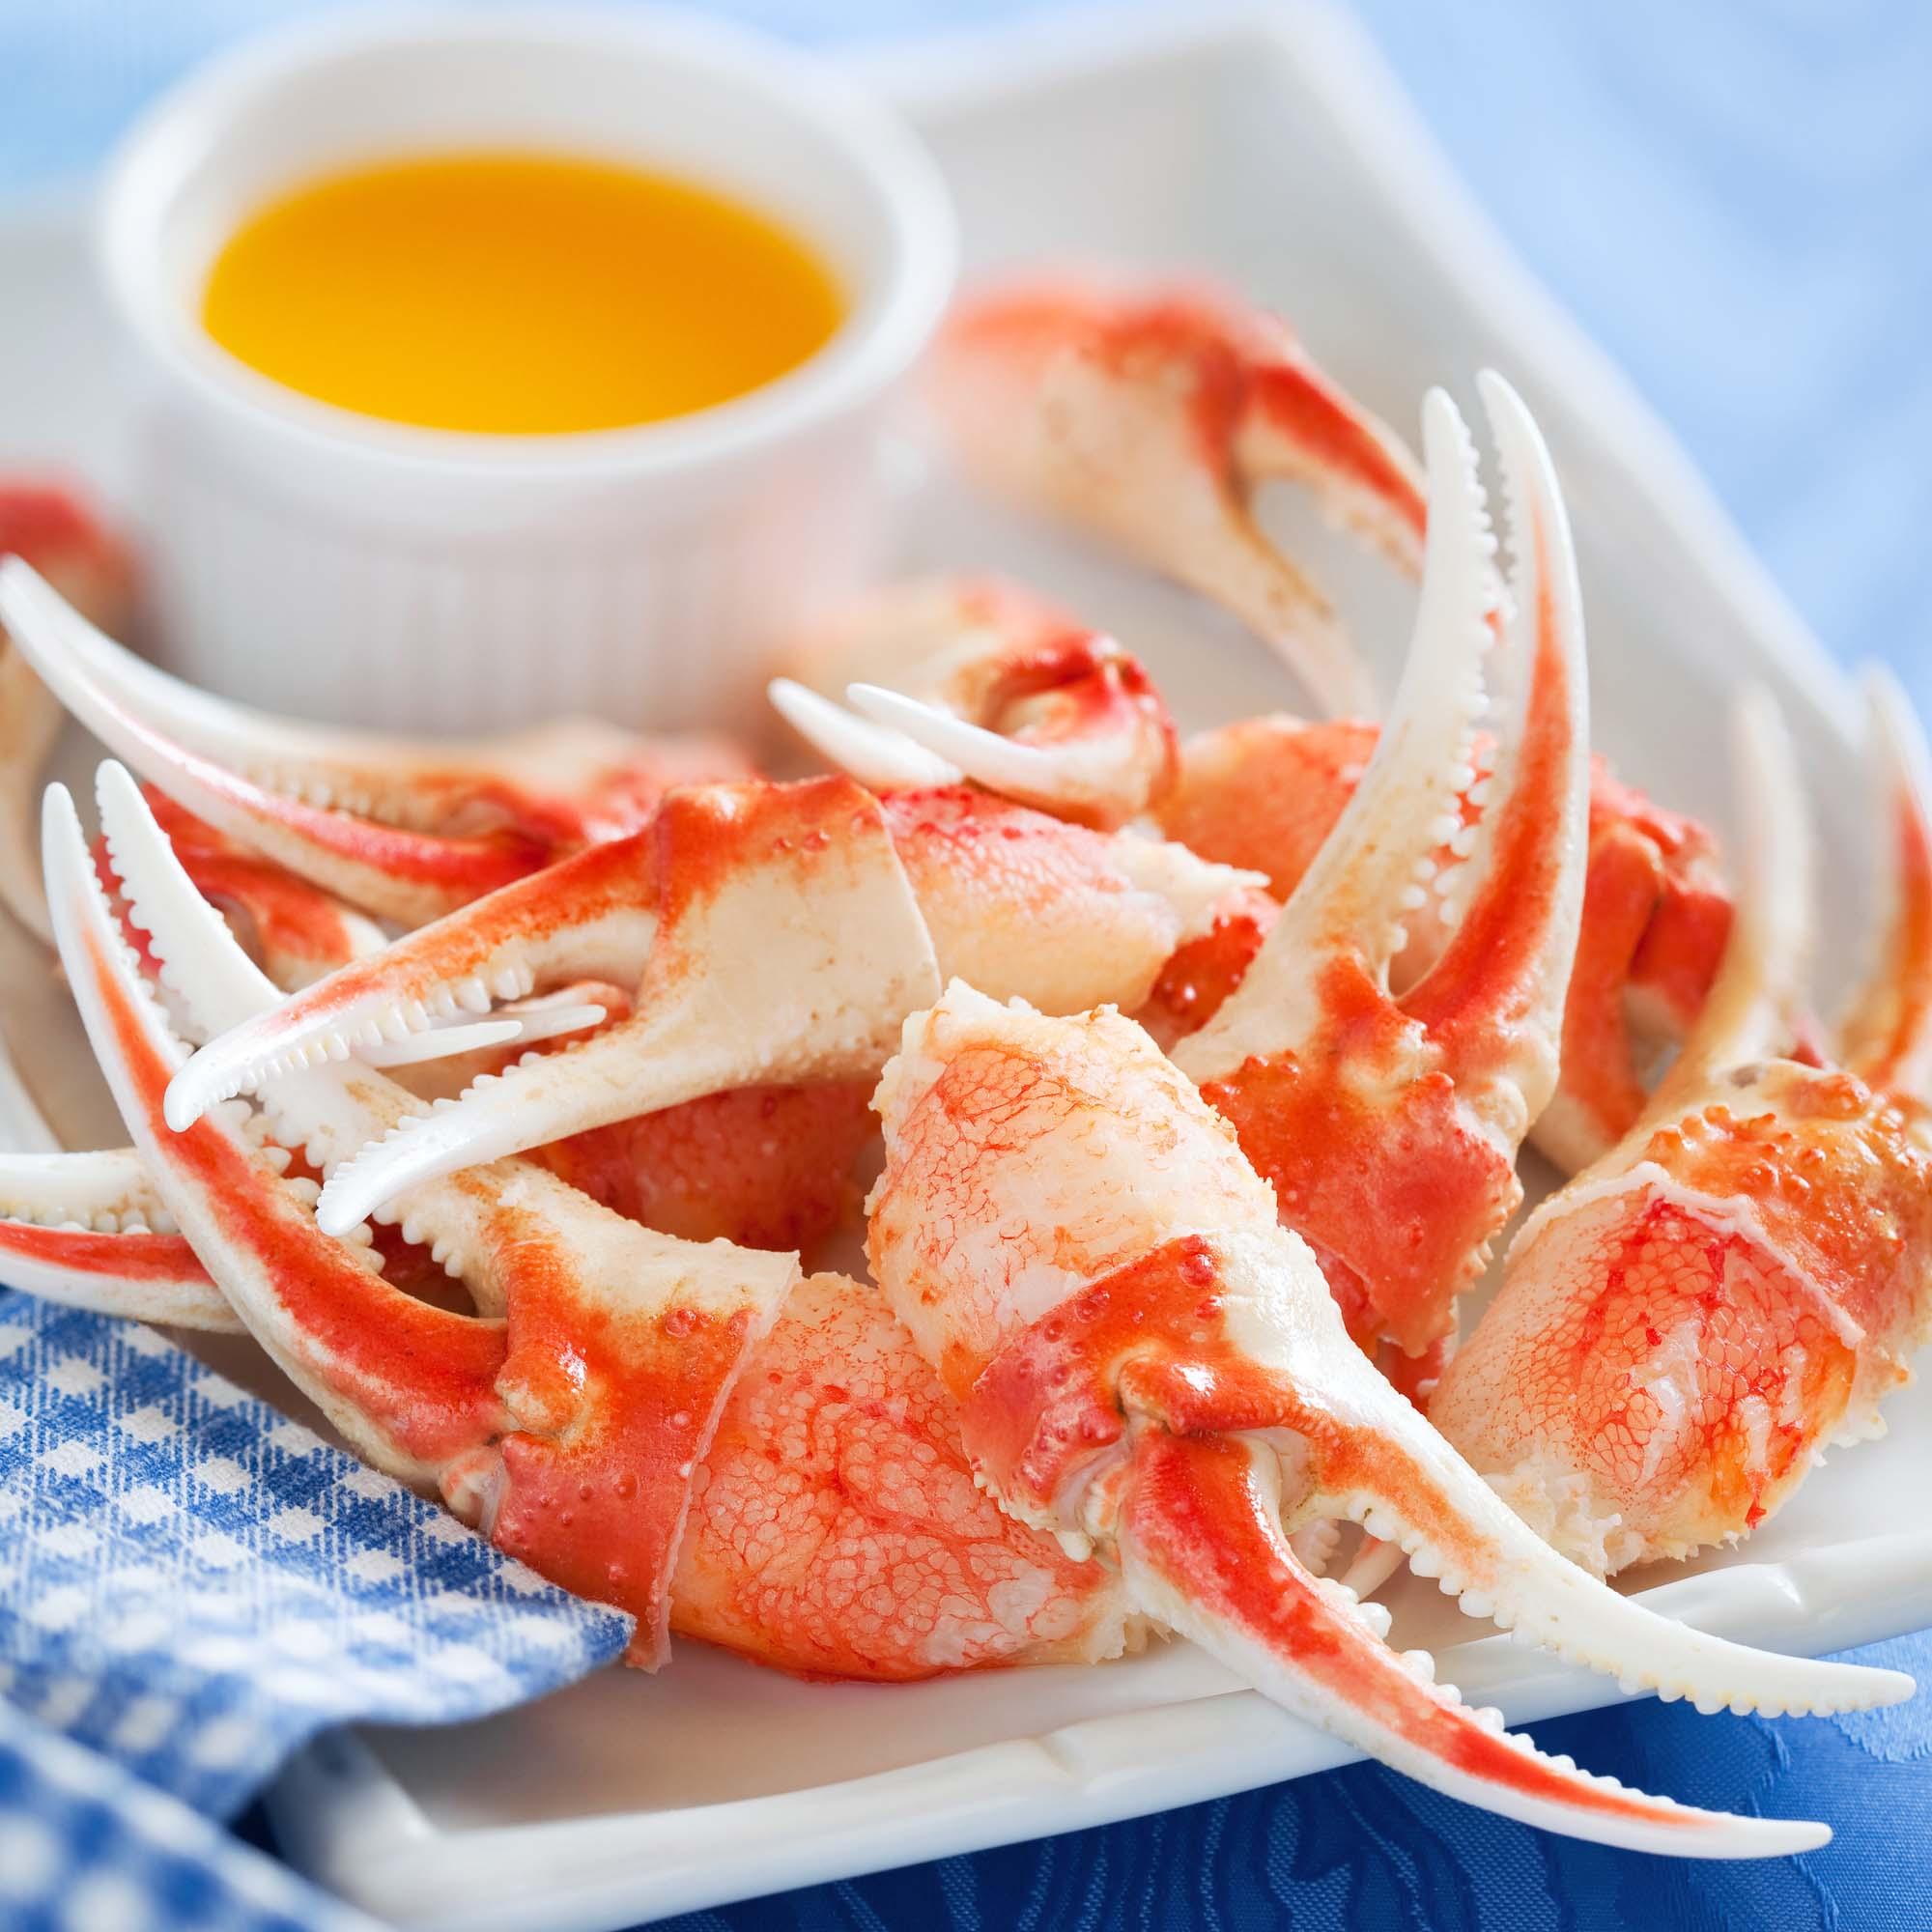 Grillede krabbekløer med honning og limemarinade